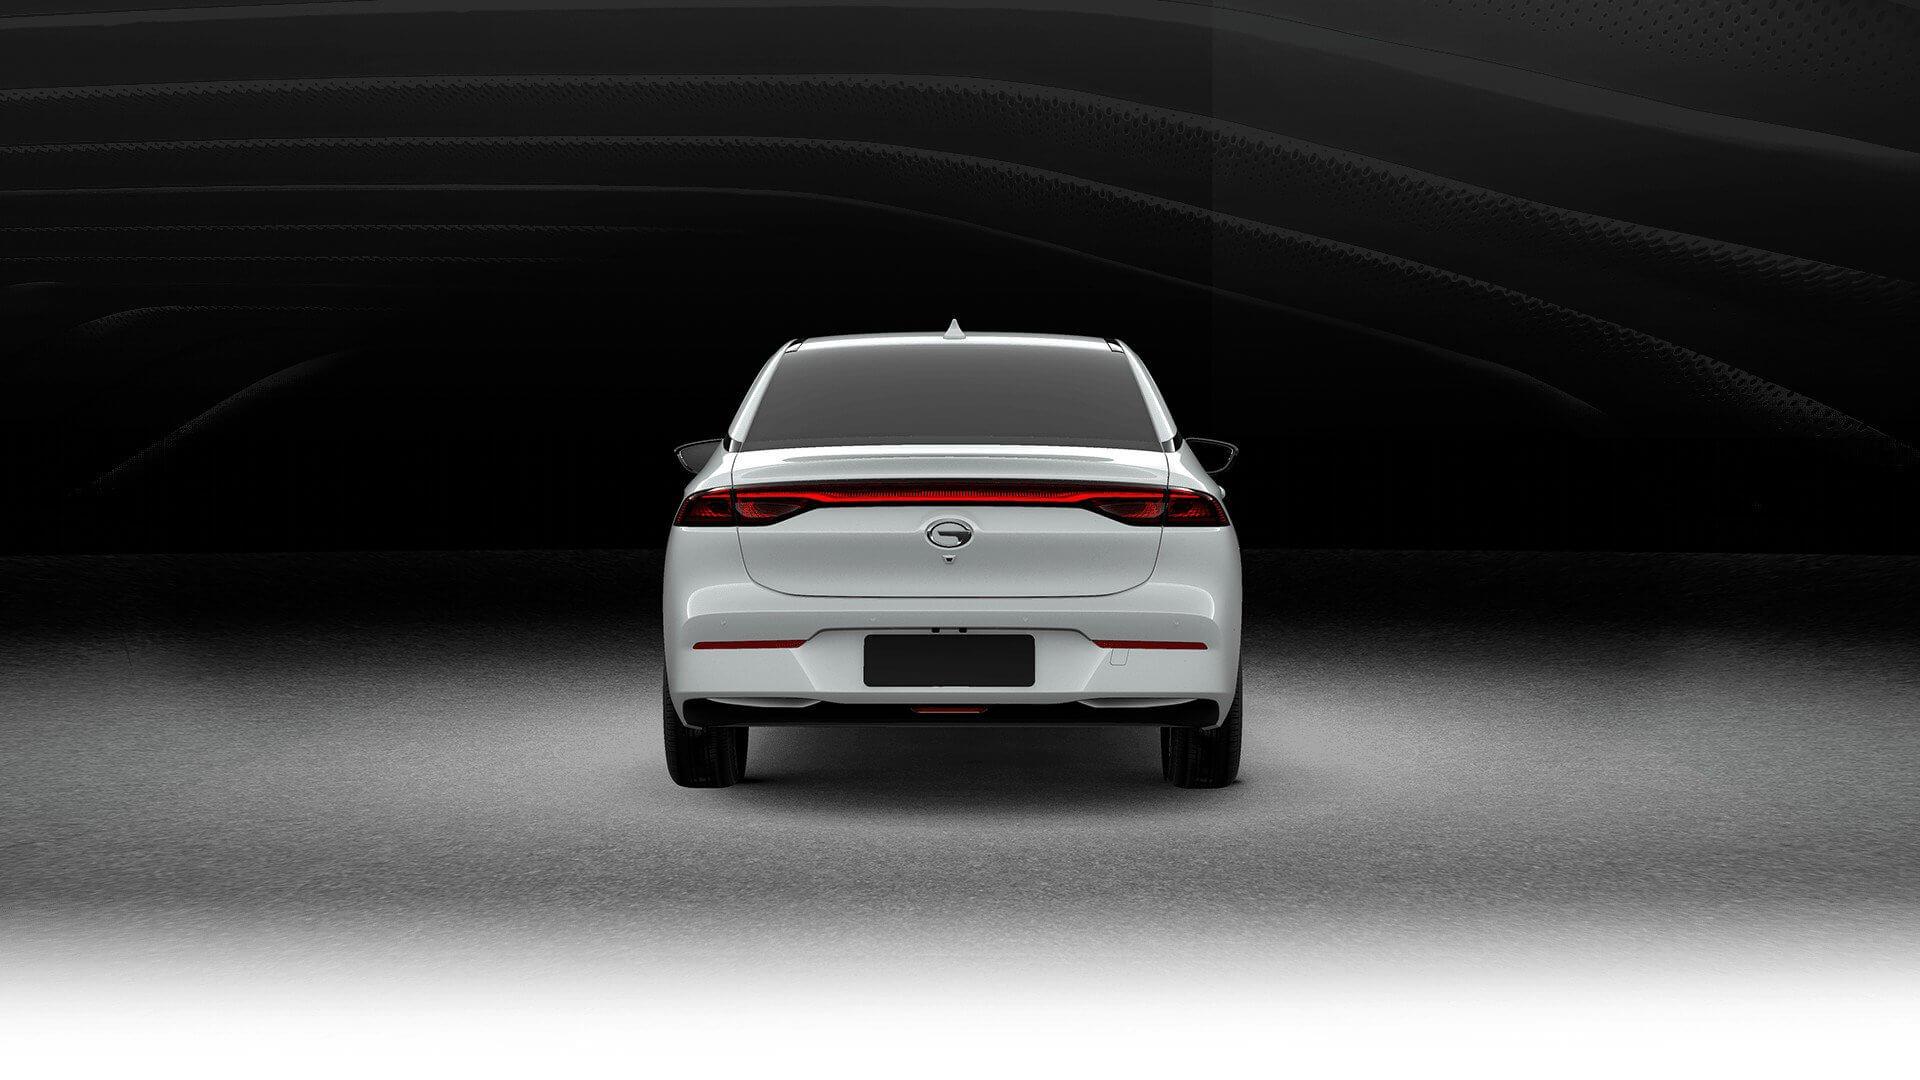 Электрический седан GAC Aion S - вид сзади